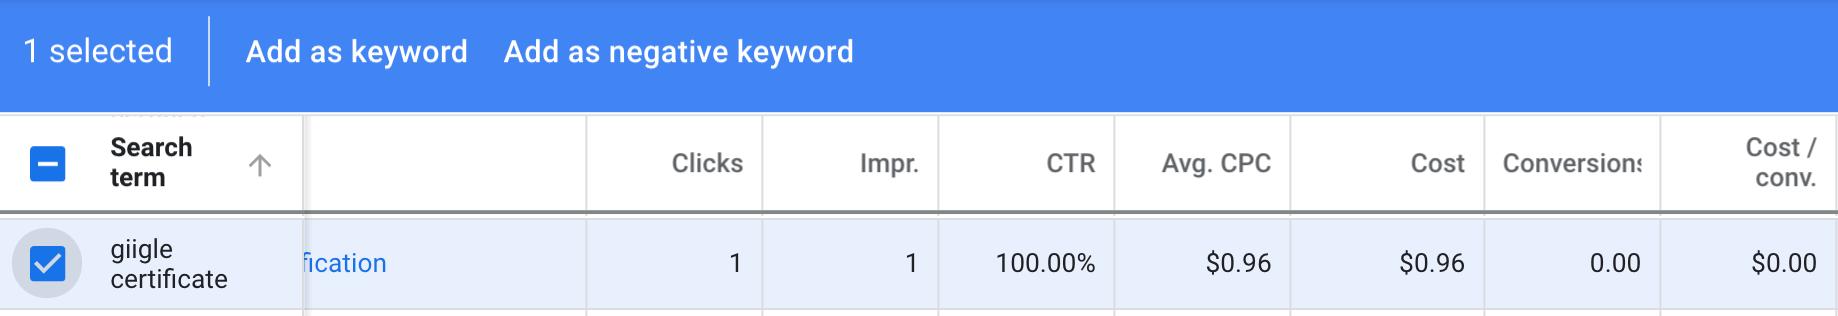 Adding Negative Keywords